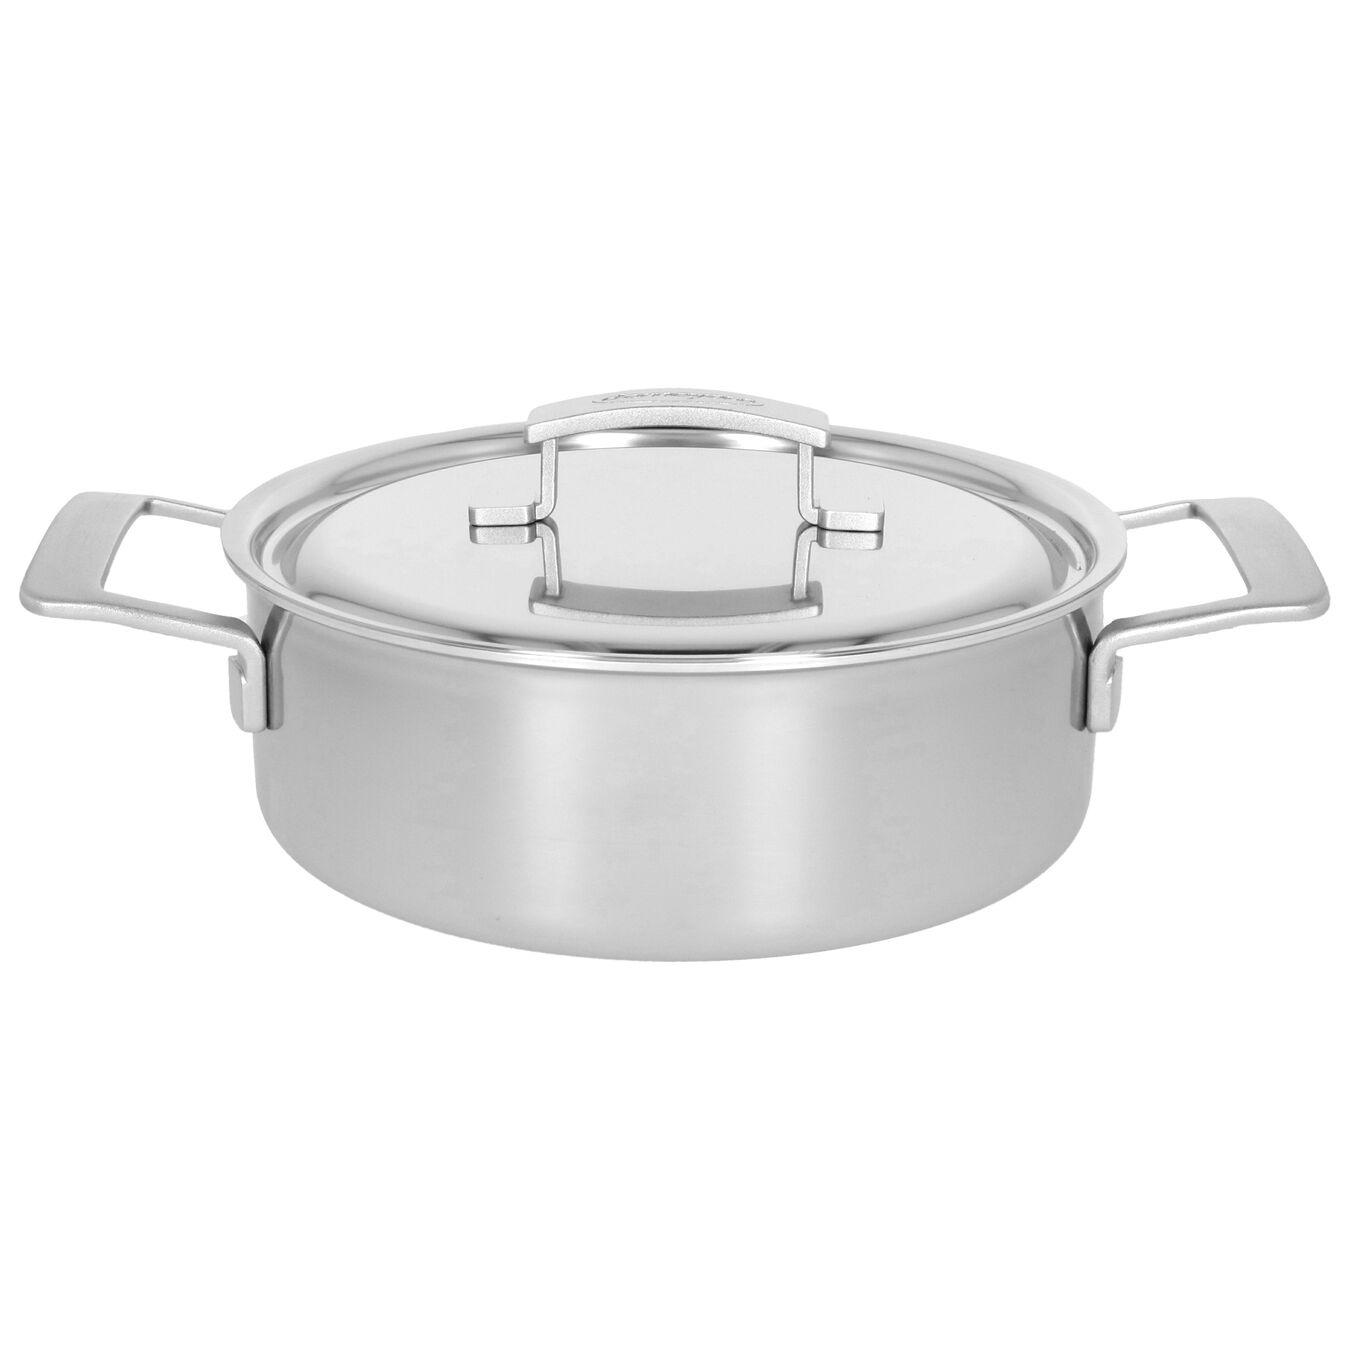 Kookpot met deksel, 24 cm / 3,8 l,,large 1